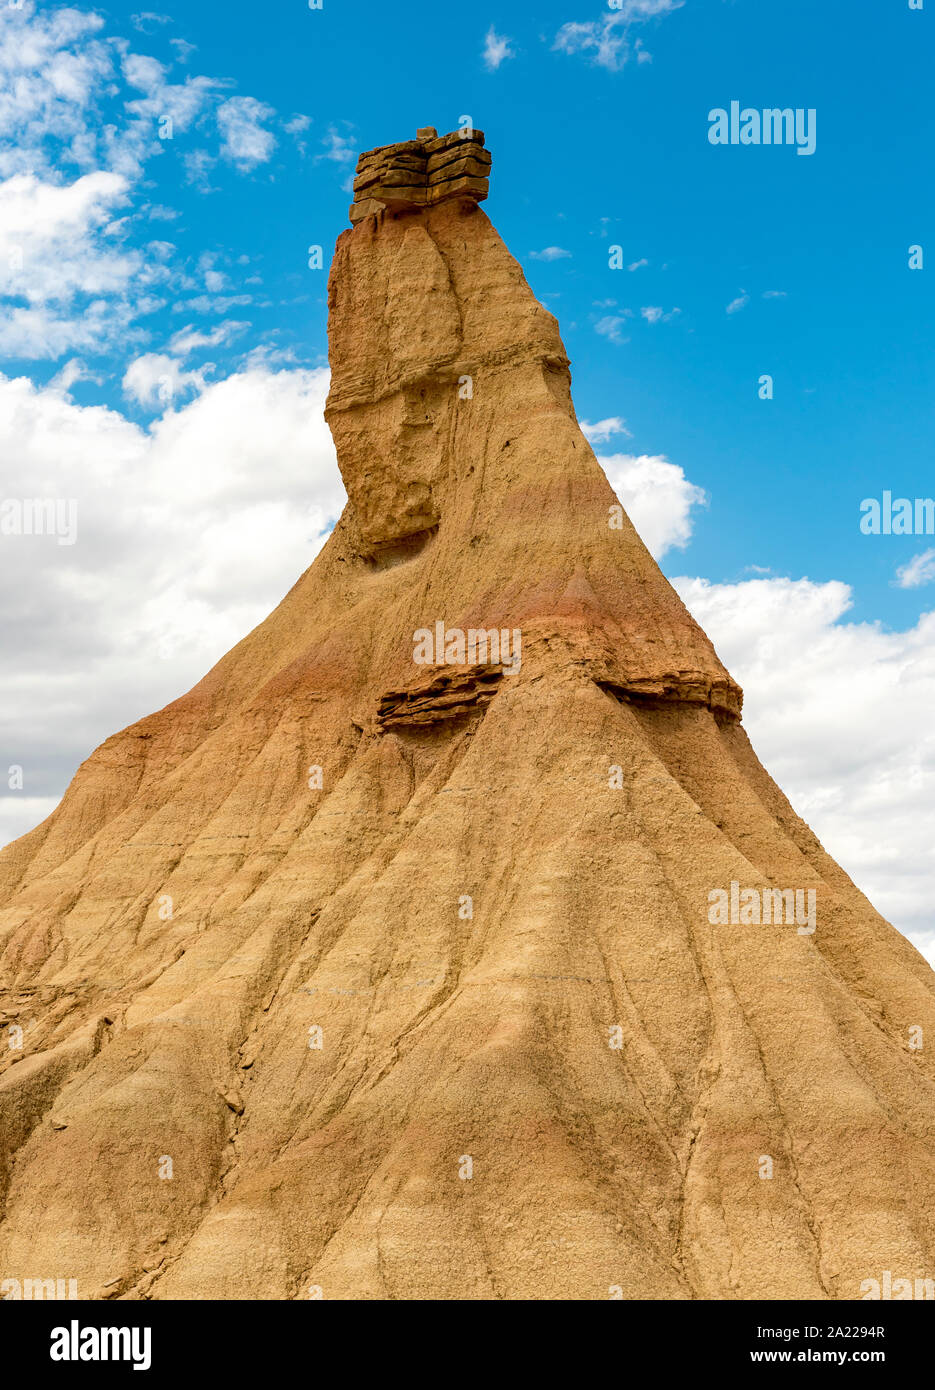 Castil de Tierra (Castildetierra) rock formation, Bardenas Reales Desert, Navarre, Spain Stock Photo